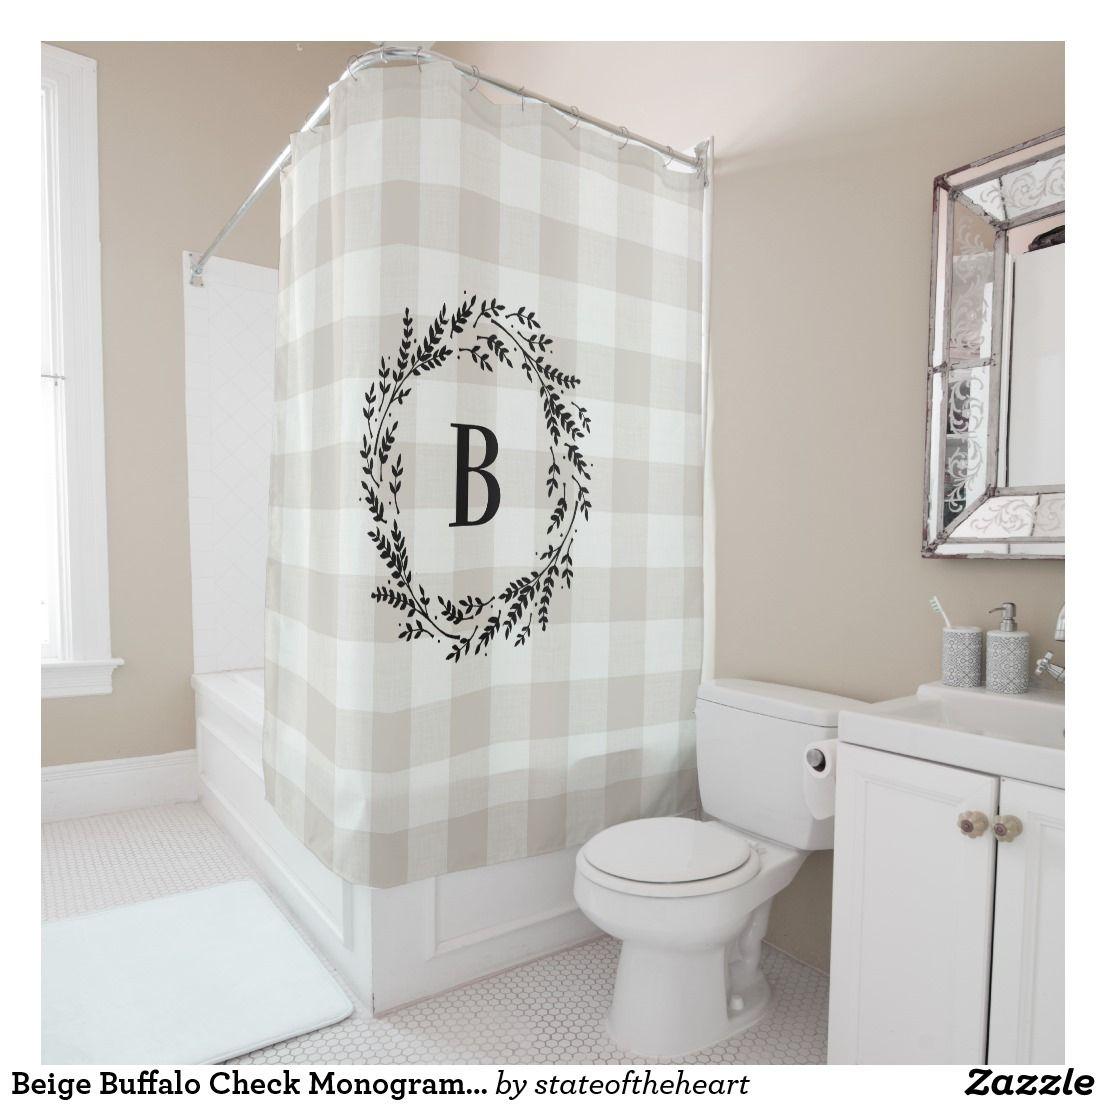 Beige Buffalo Check Monogram Farmhouse Bathroom Shower Curtain Zazzle Com Bathroom Shower Curtains Farmhouse Shower Shower Curtain Monogram